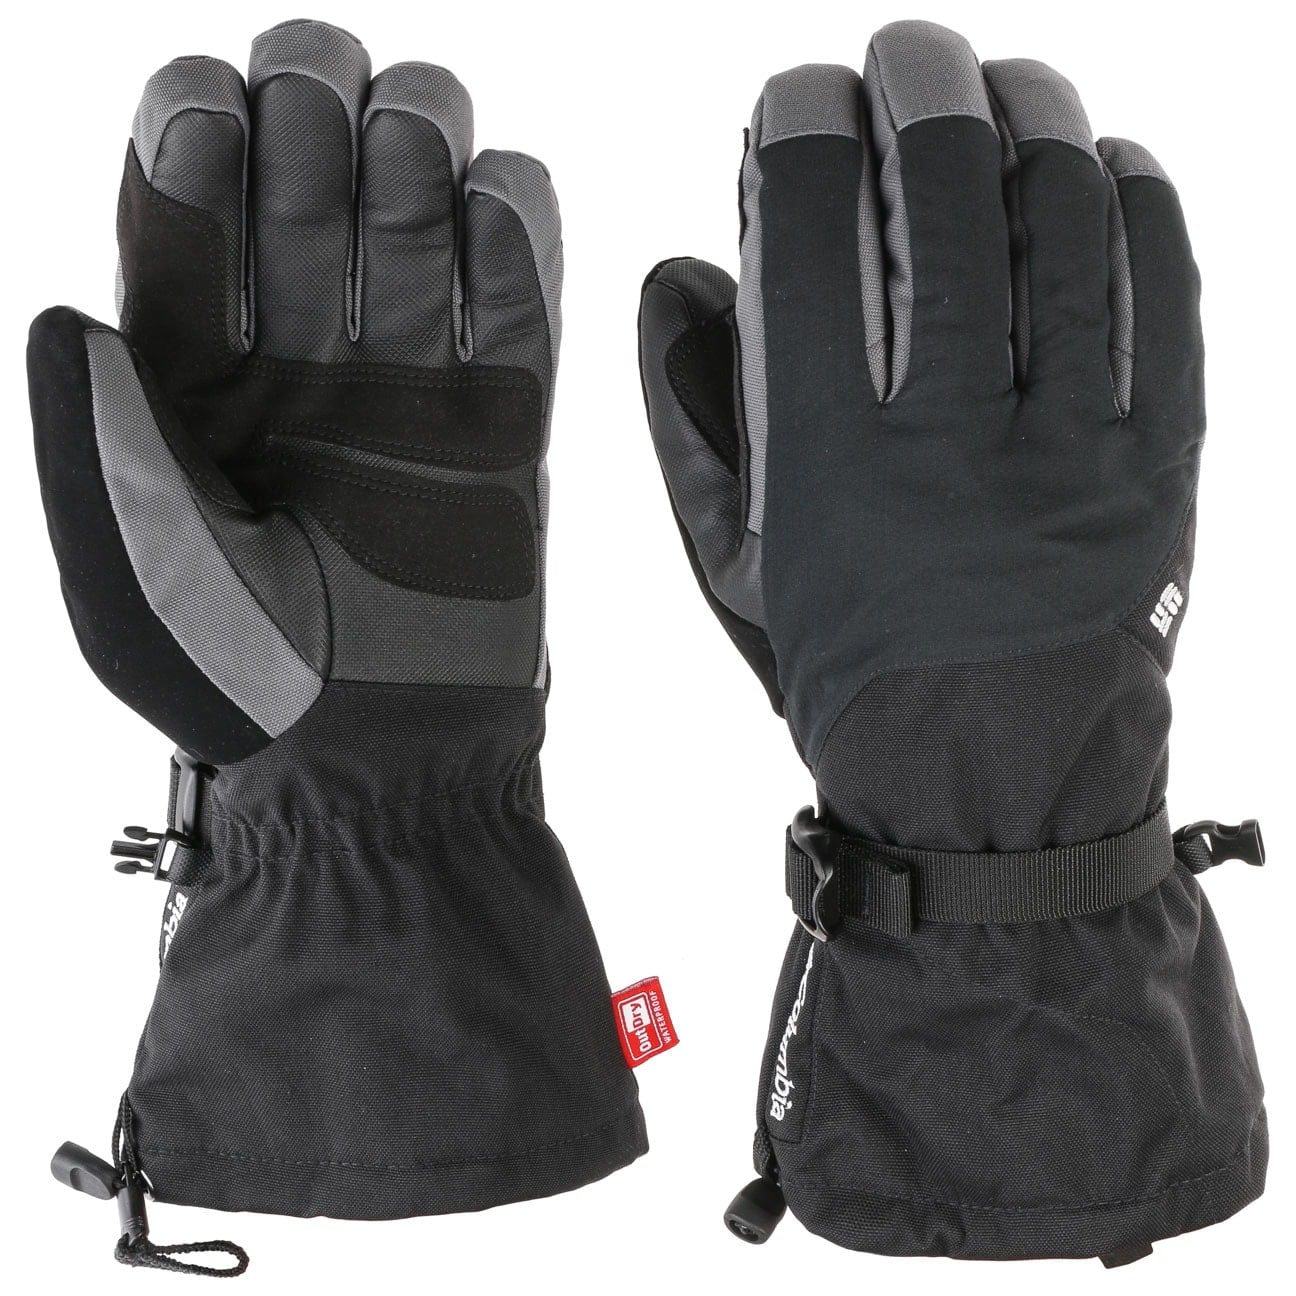 Guantes de Hombre Range OutDry by Columbia  guantes con dedos